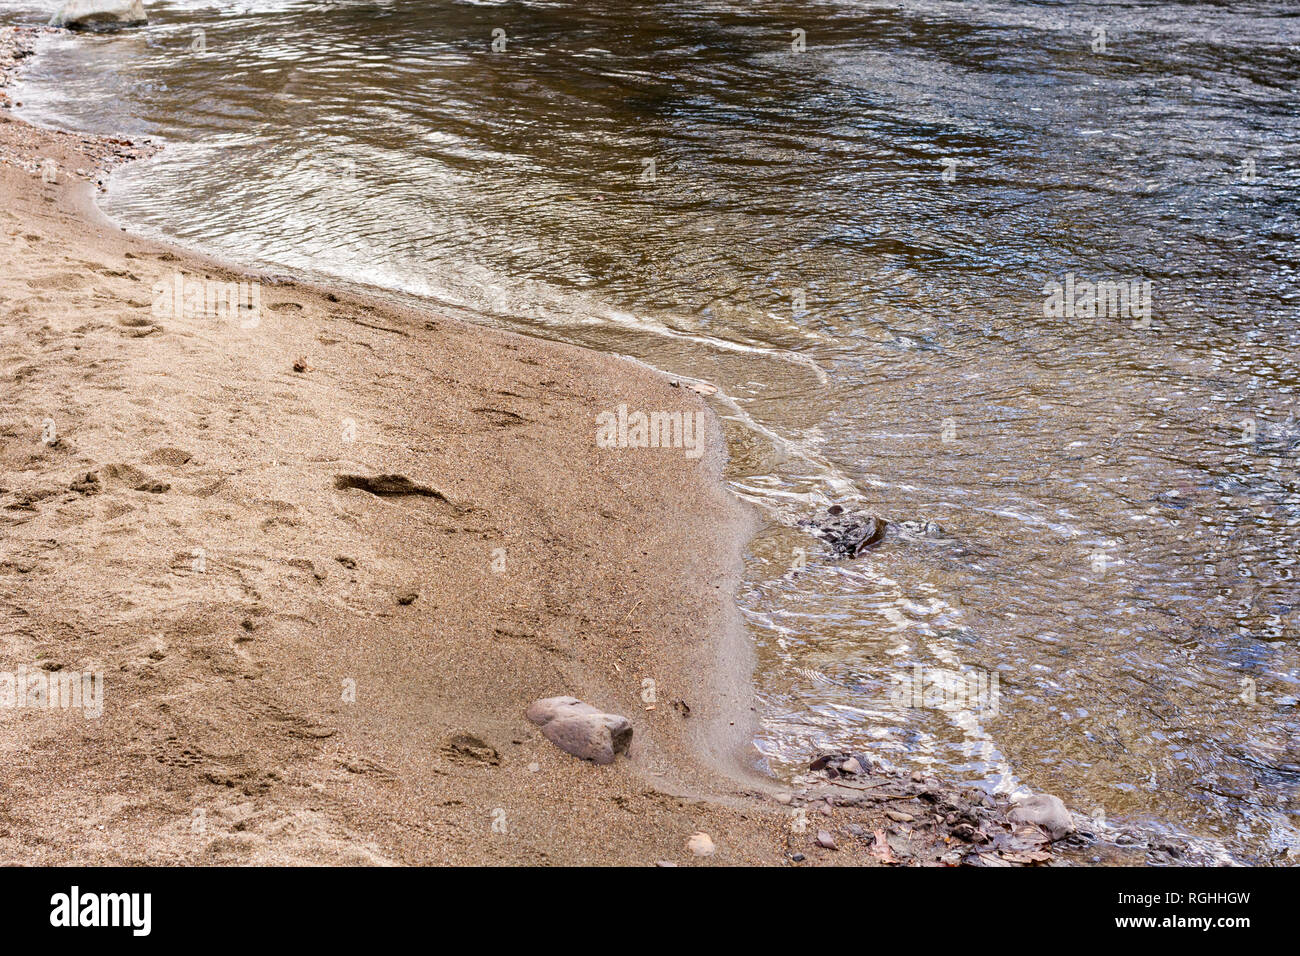 Water lapping onto sand, UK - Stock Image